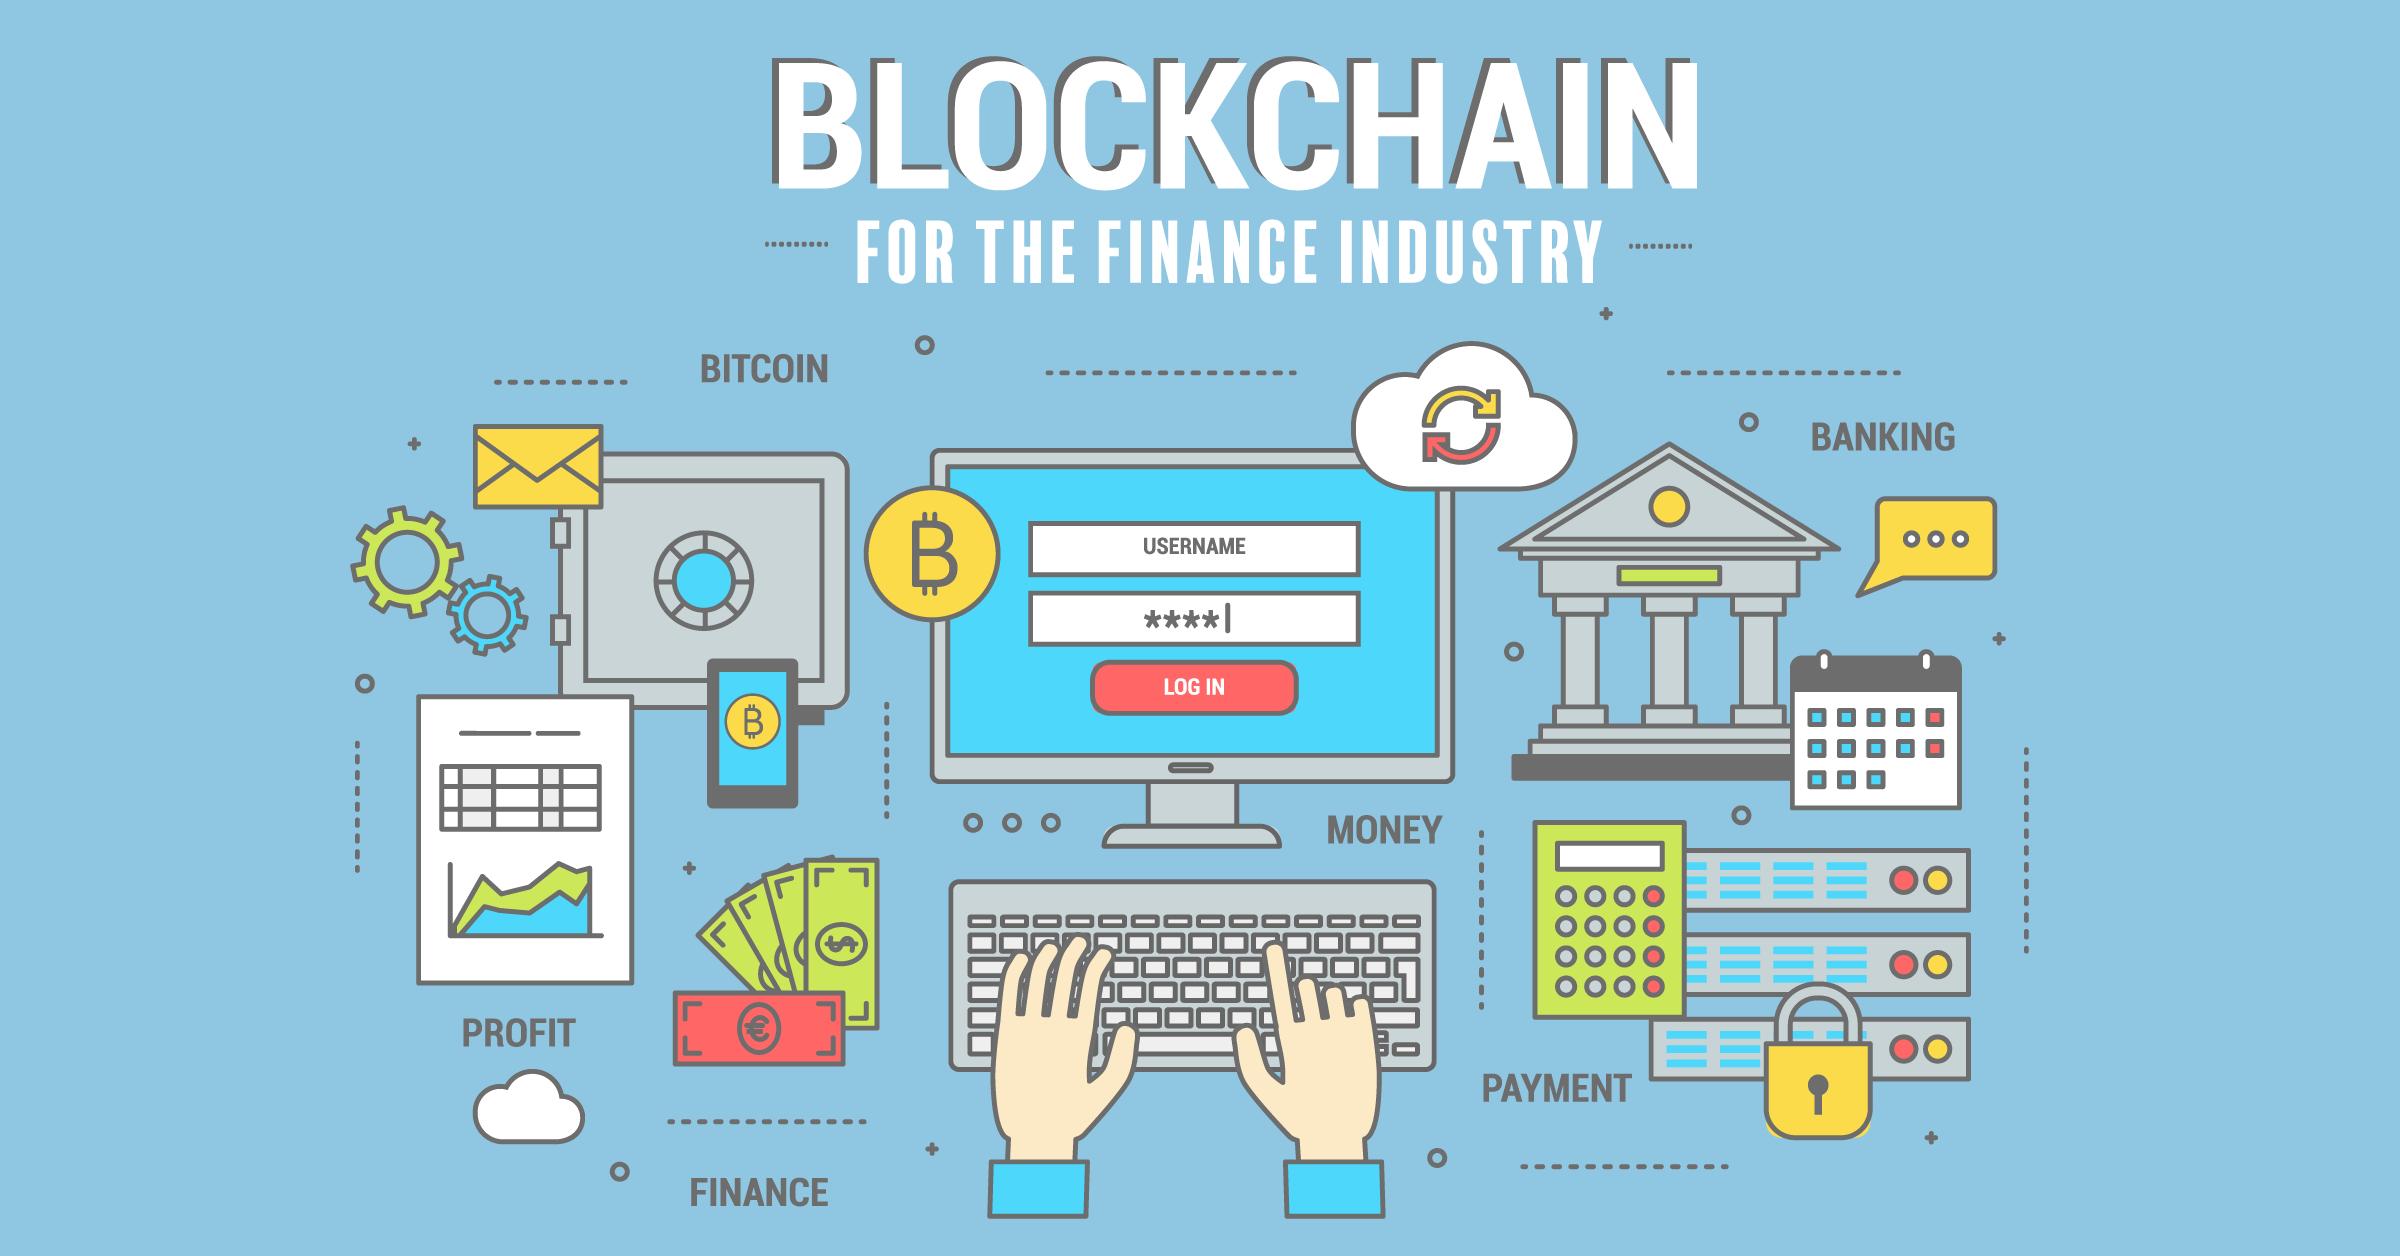 Blockchain for Finance Industry